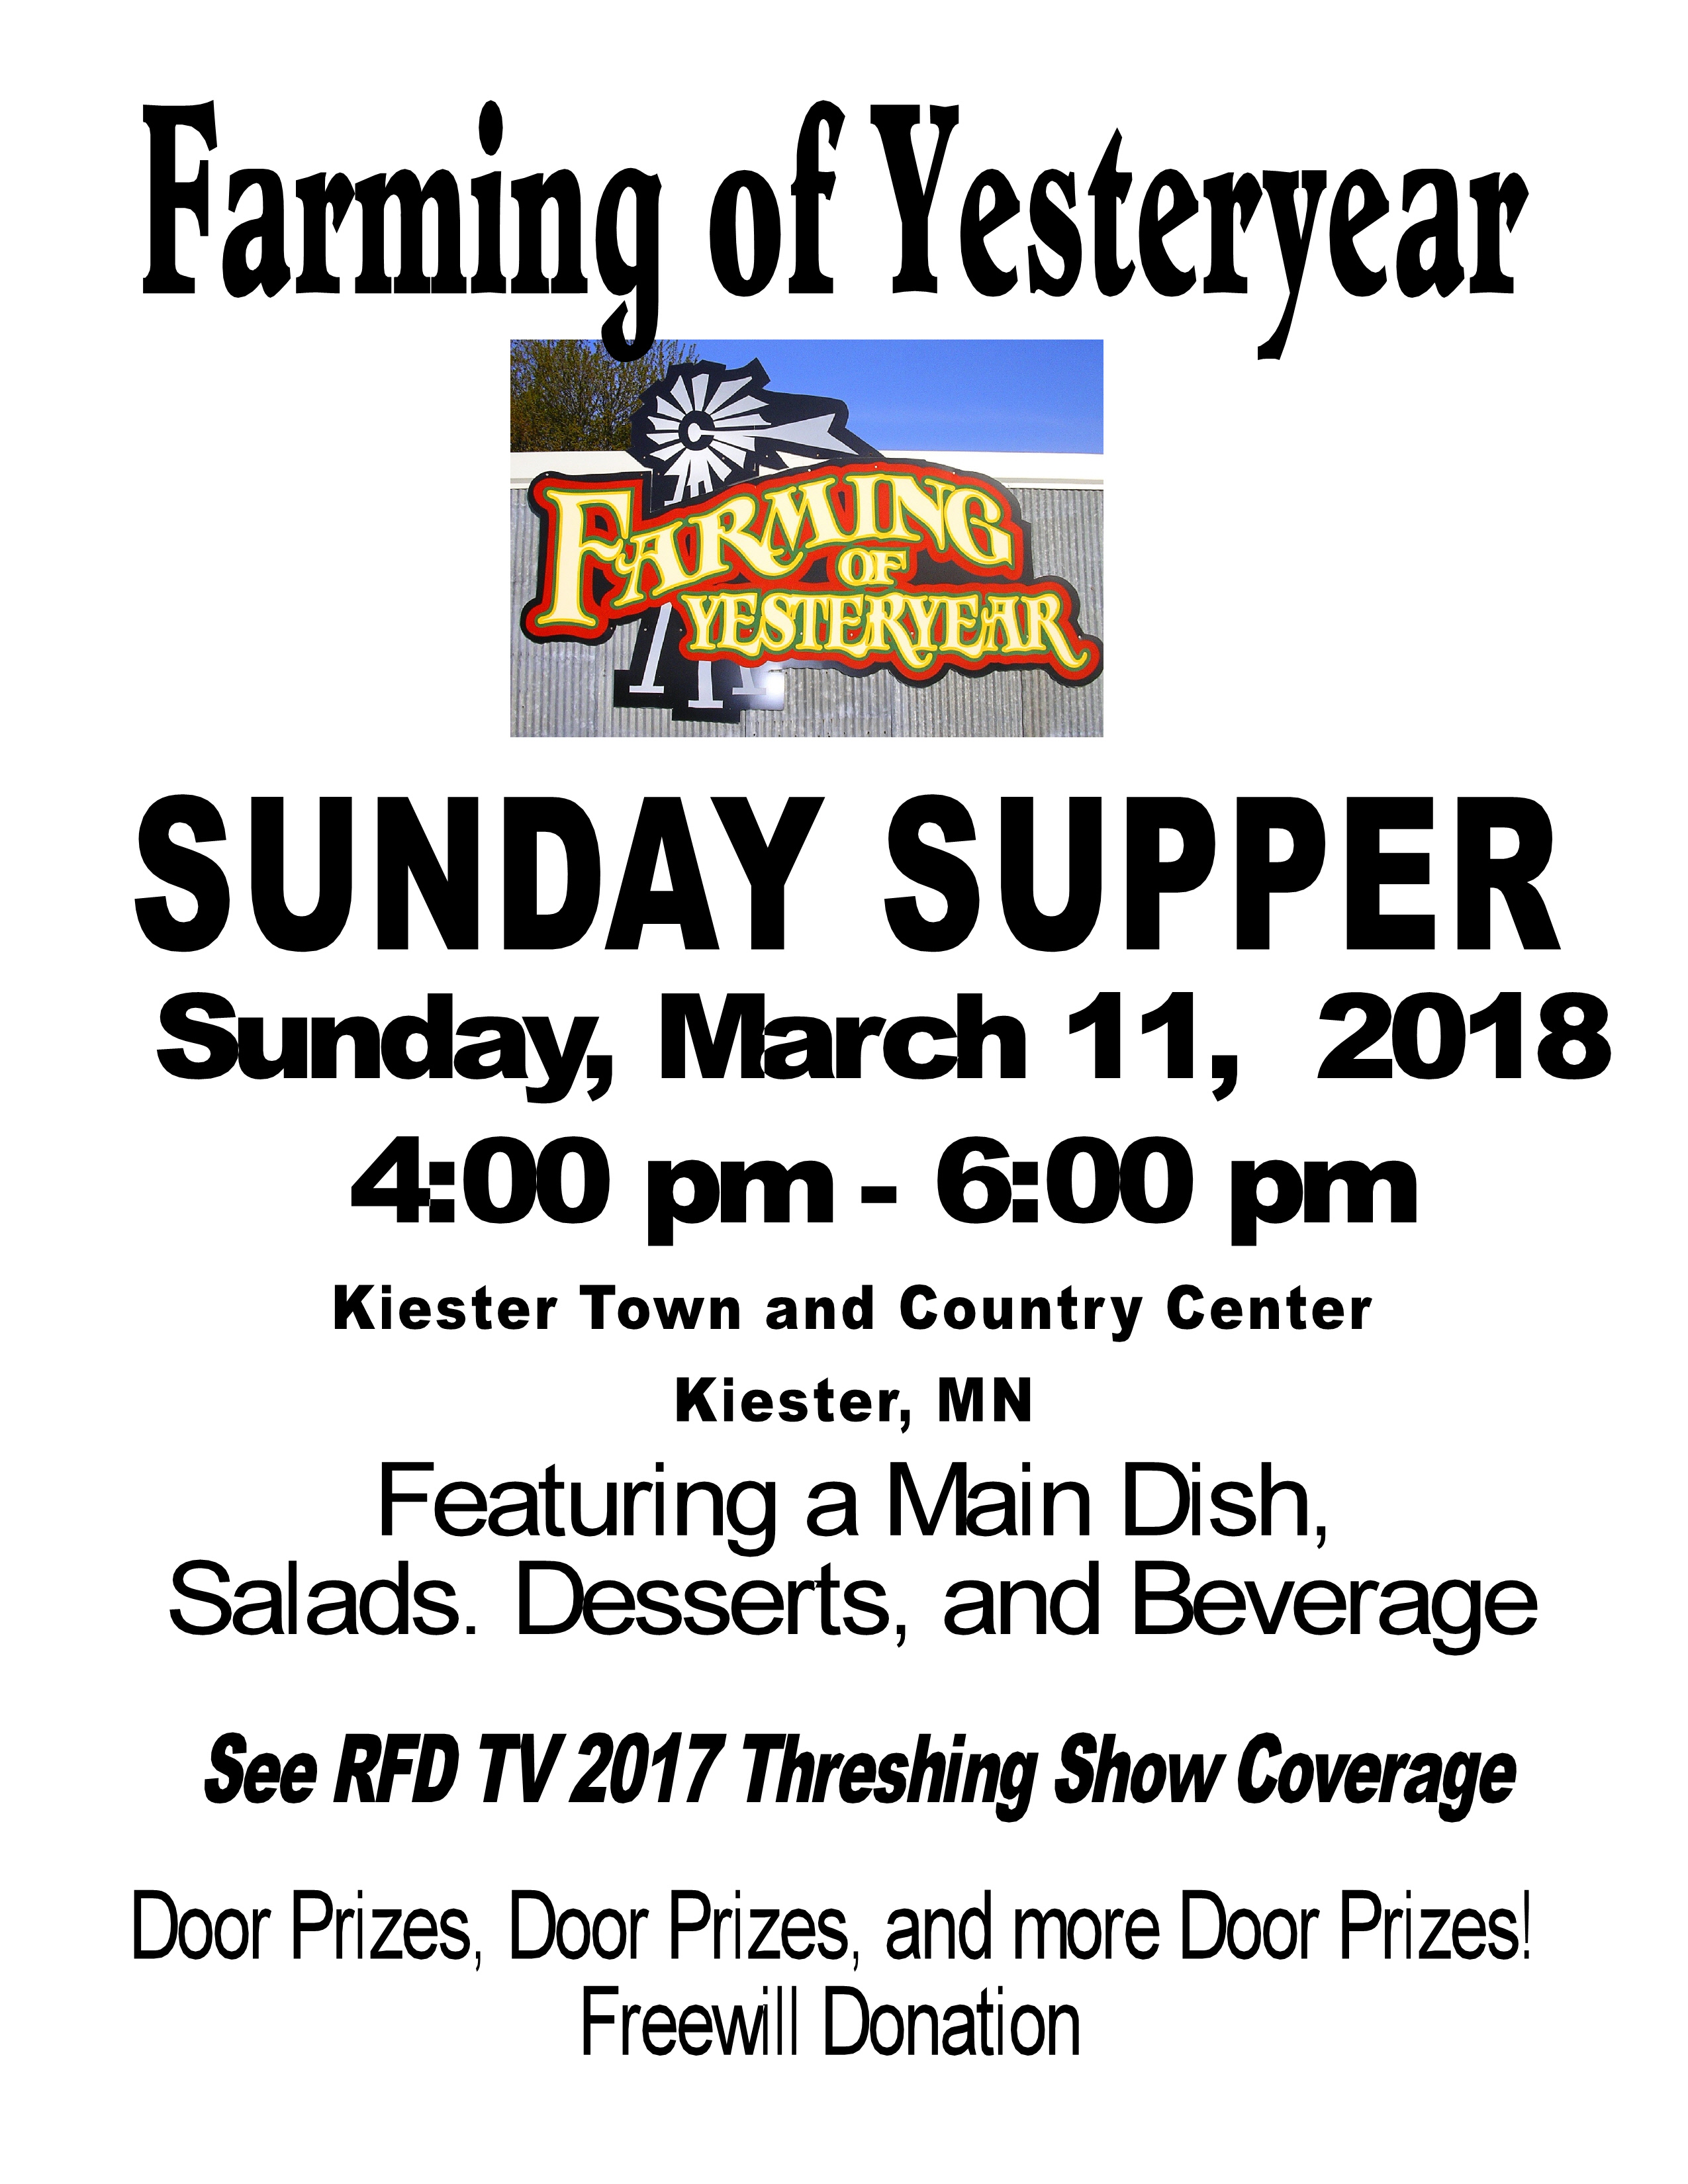 2018 FOY Sunday Supper sign-jpg